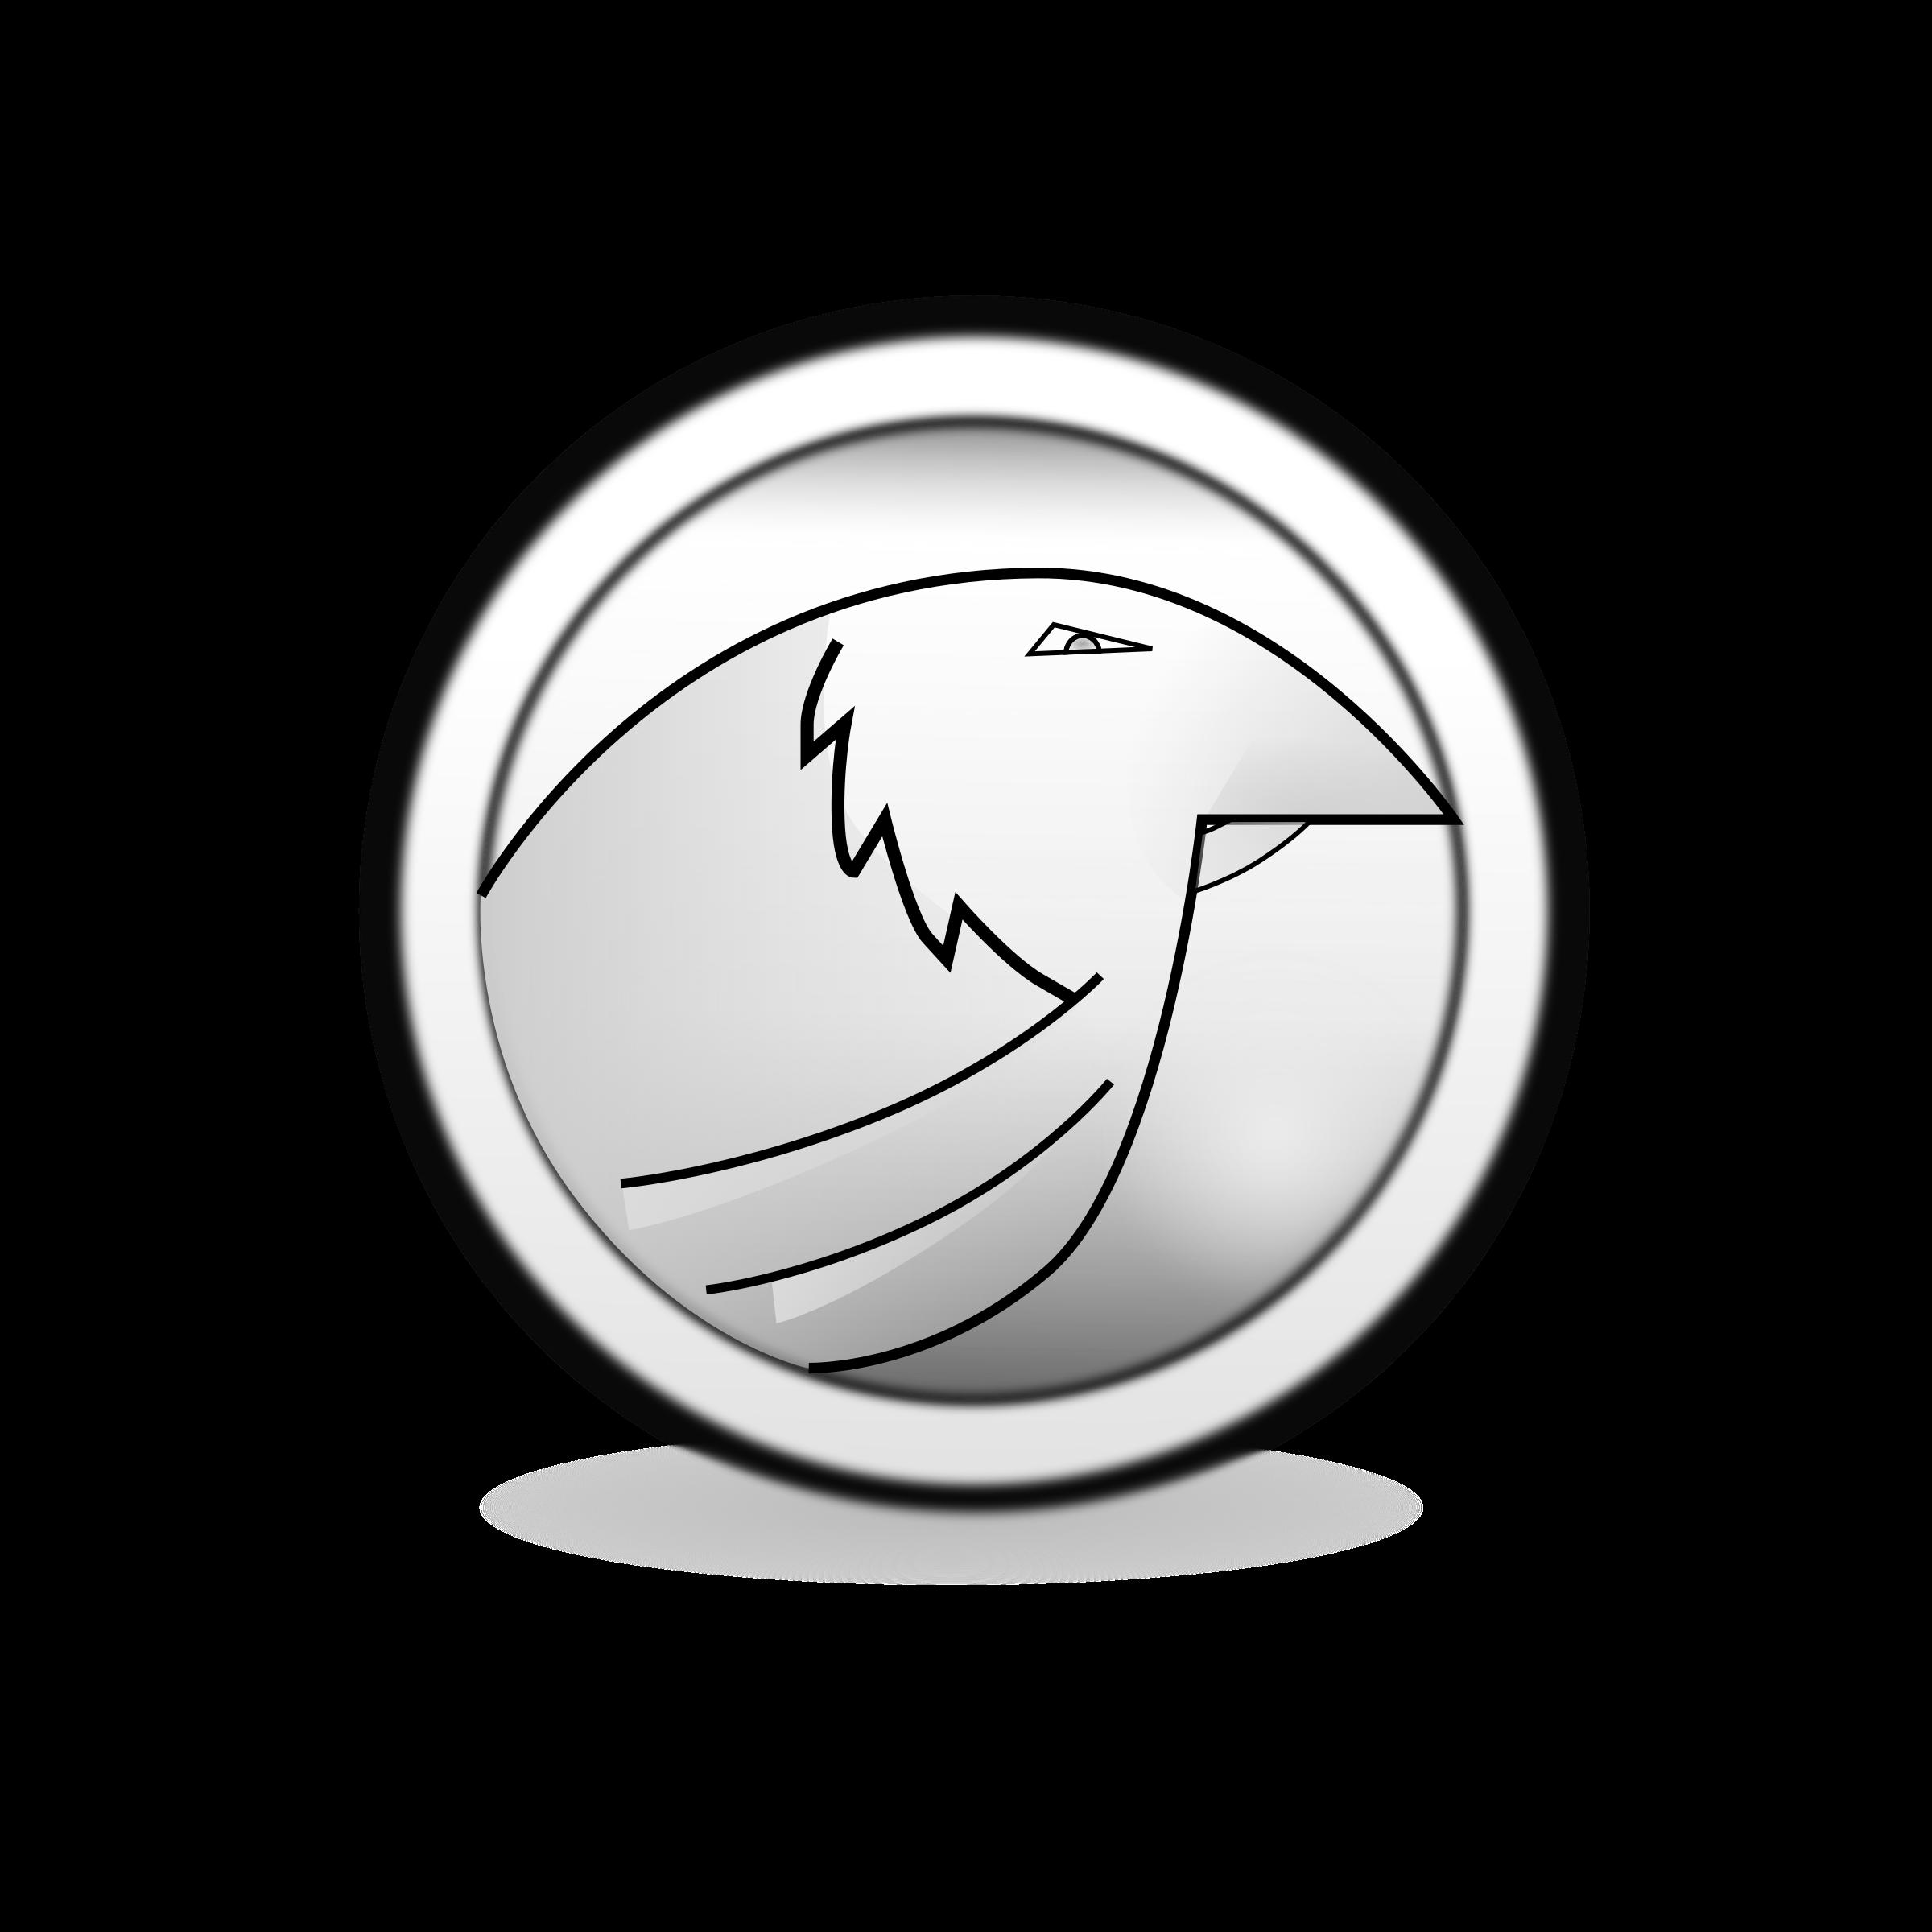 vector freeuse stock Bull clipart baby bobcat. Eagle logo animal free